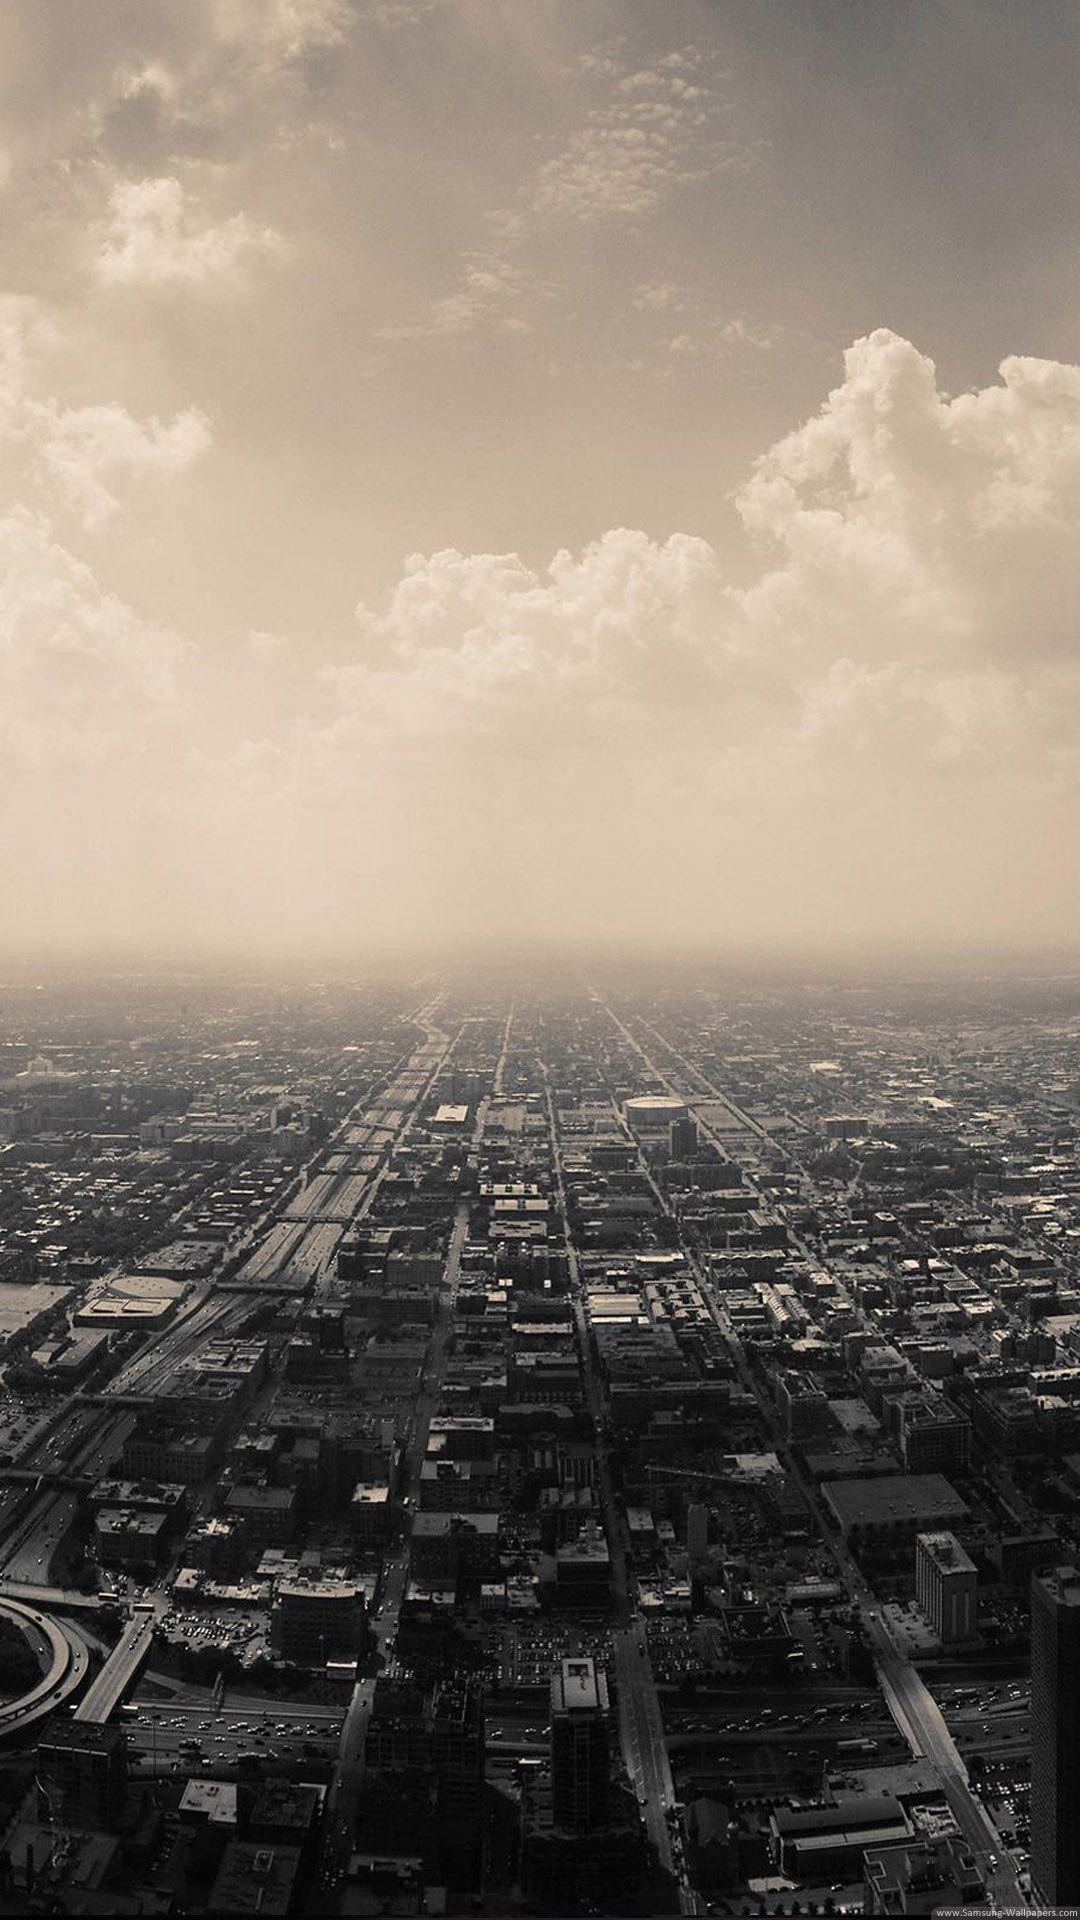 Hd wallpaper city - Gloomy City Skyline Iphone 6 Plus Hd Wallpaper